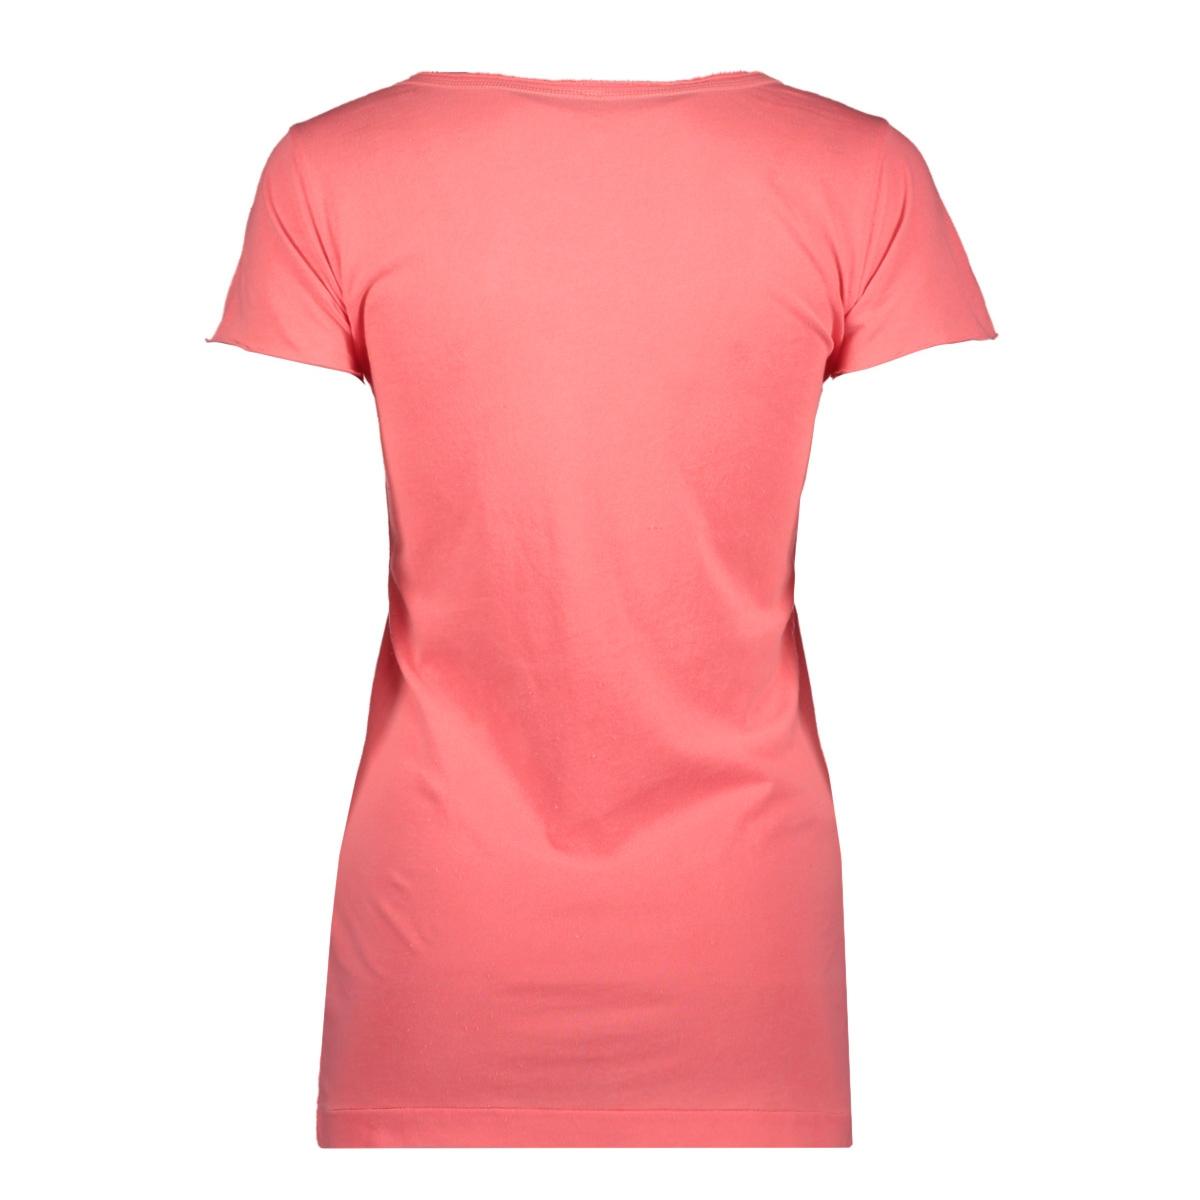 shortsleeve tee 20 742 9101 10 days t-shirt fluor peach